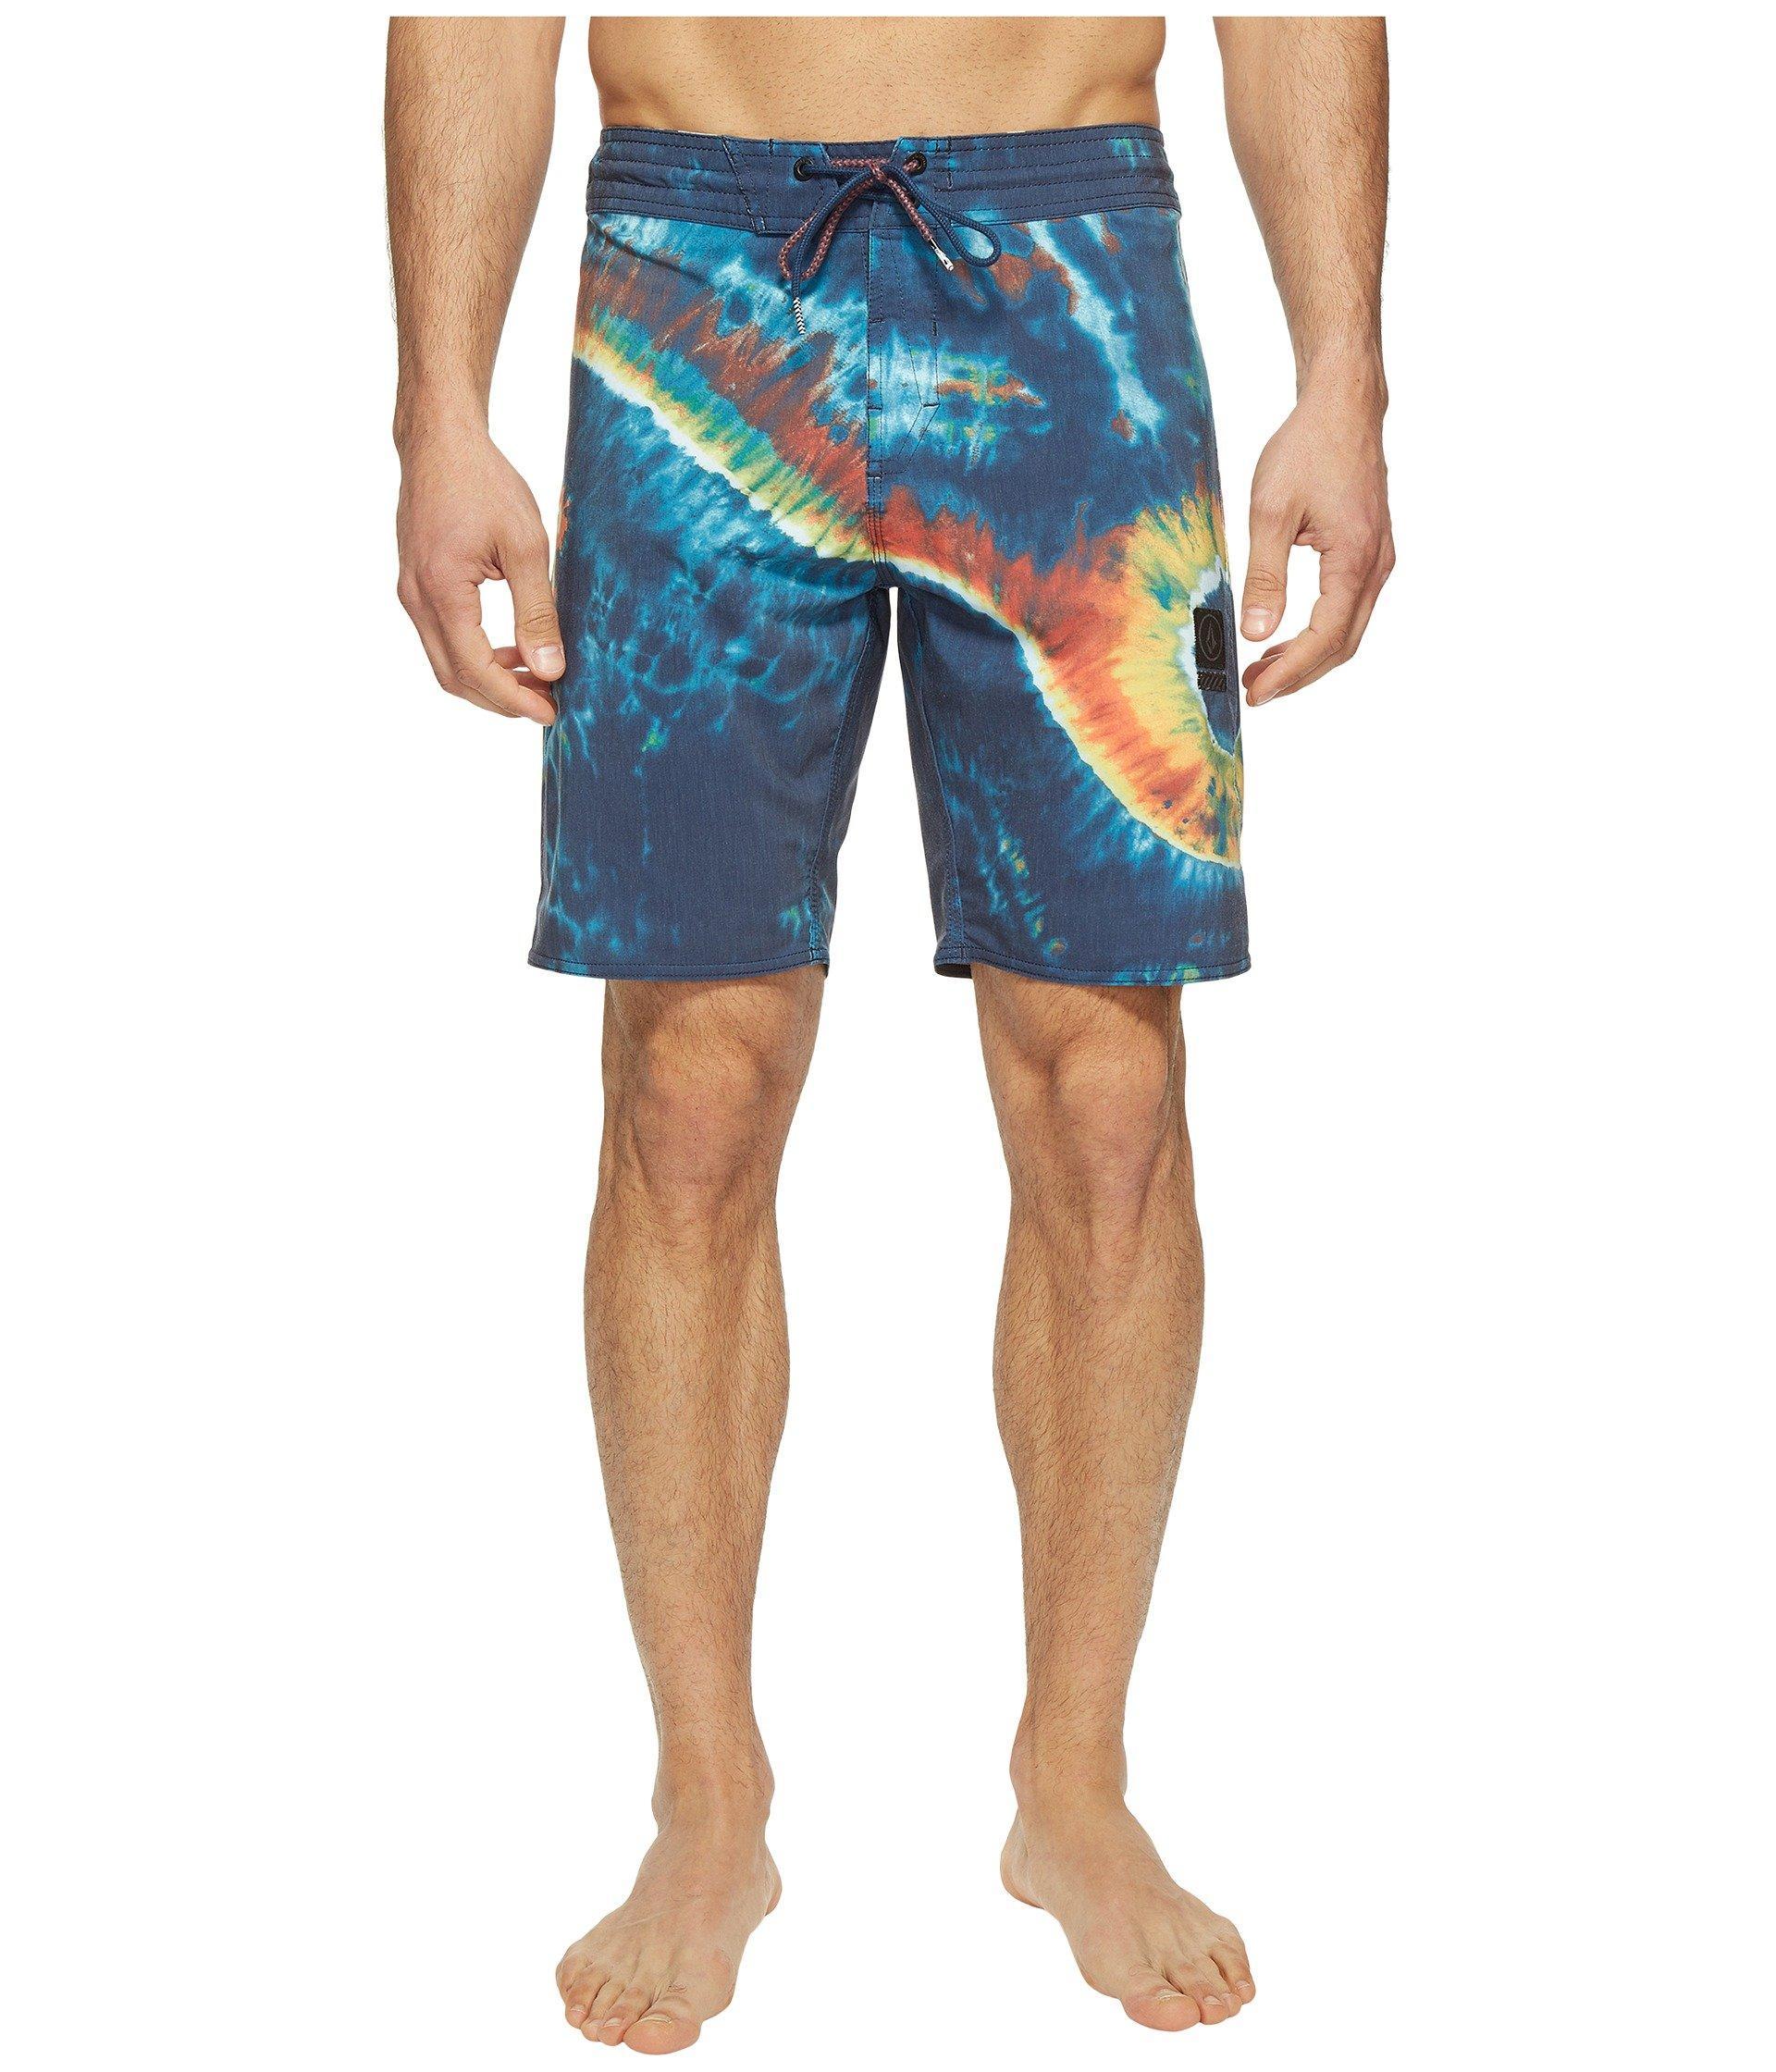 "Pantalóneta de Baño para Hombre Volcom Yin Yang Slinger 19"" Boardshorts  + Volcom en VeoyCompro.net"